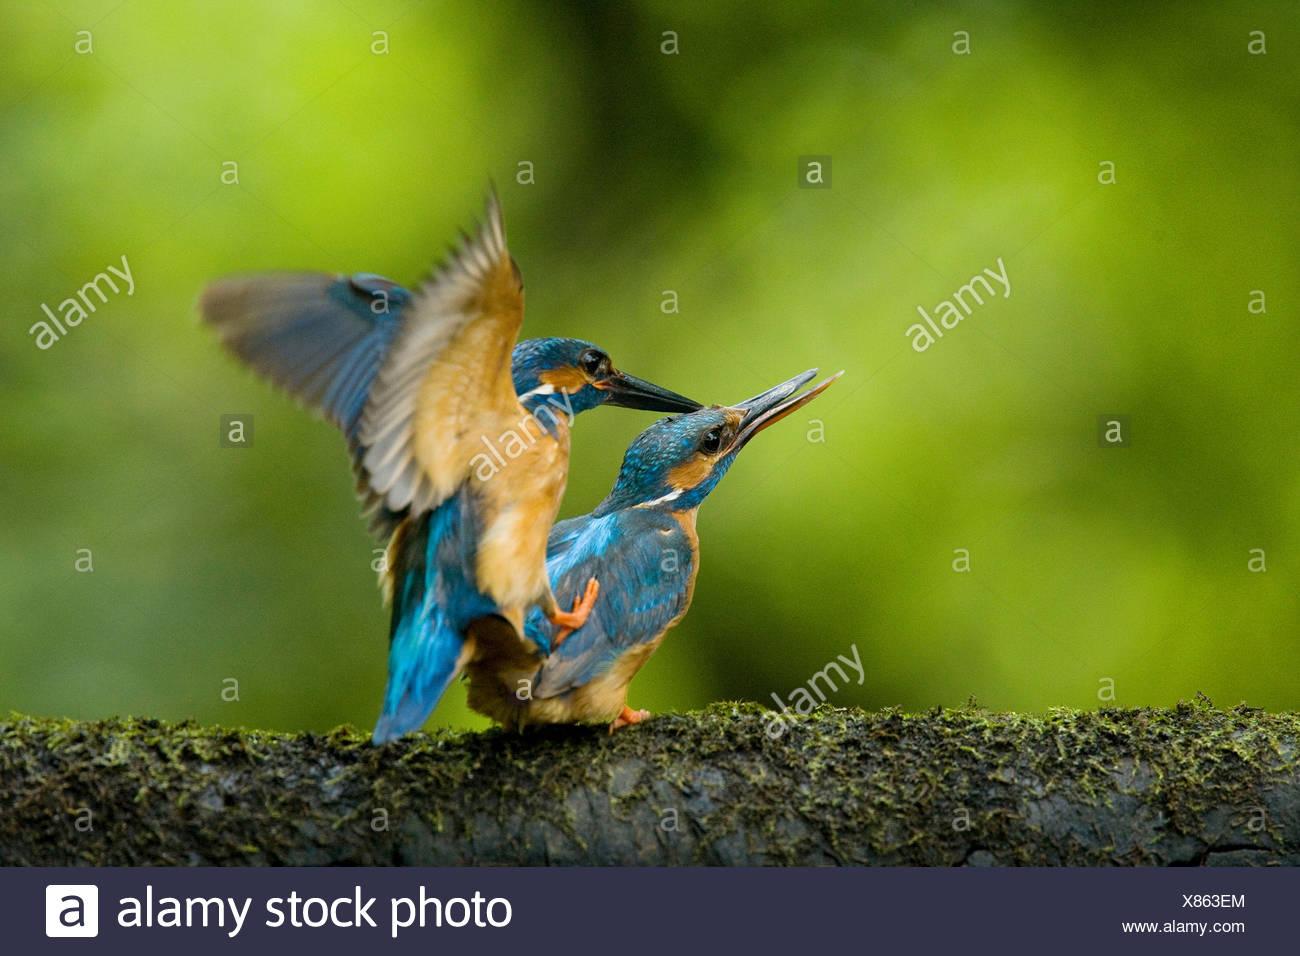 Un homme, haut, Kingfisher Alcedo atthis, commune, s'accouple avec une femelle. Photo Stock